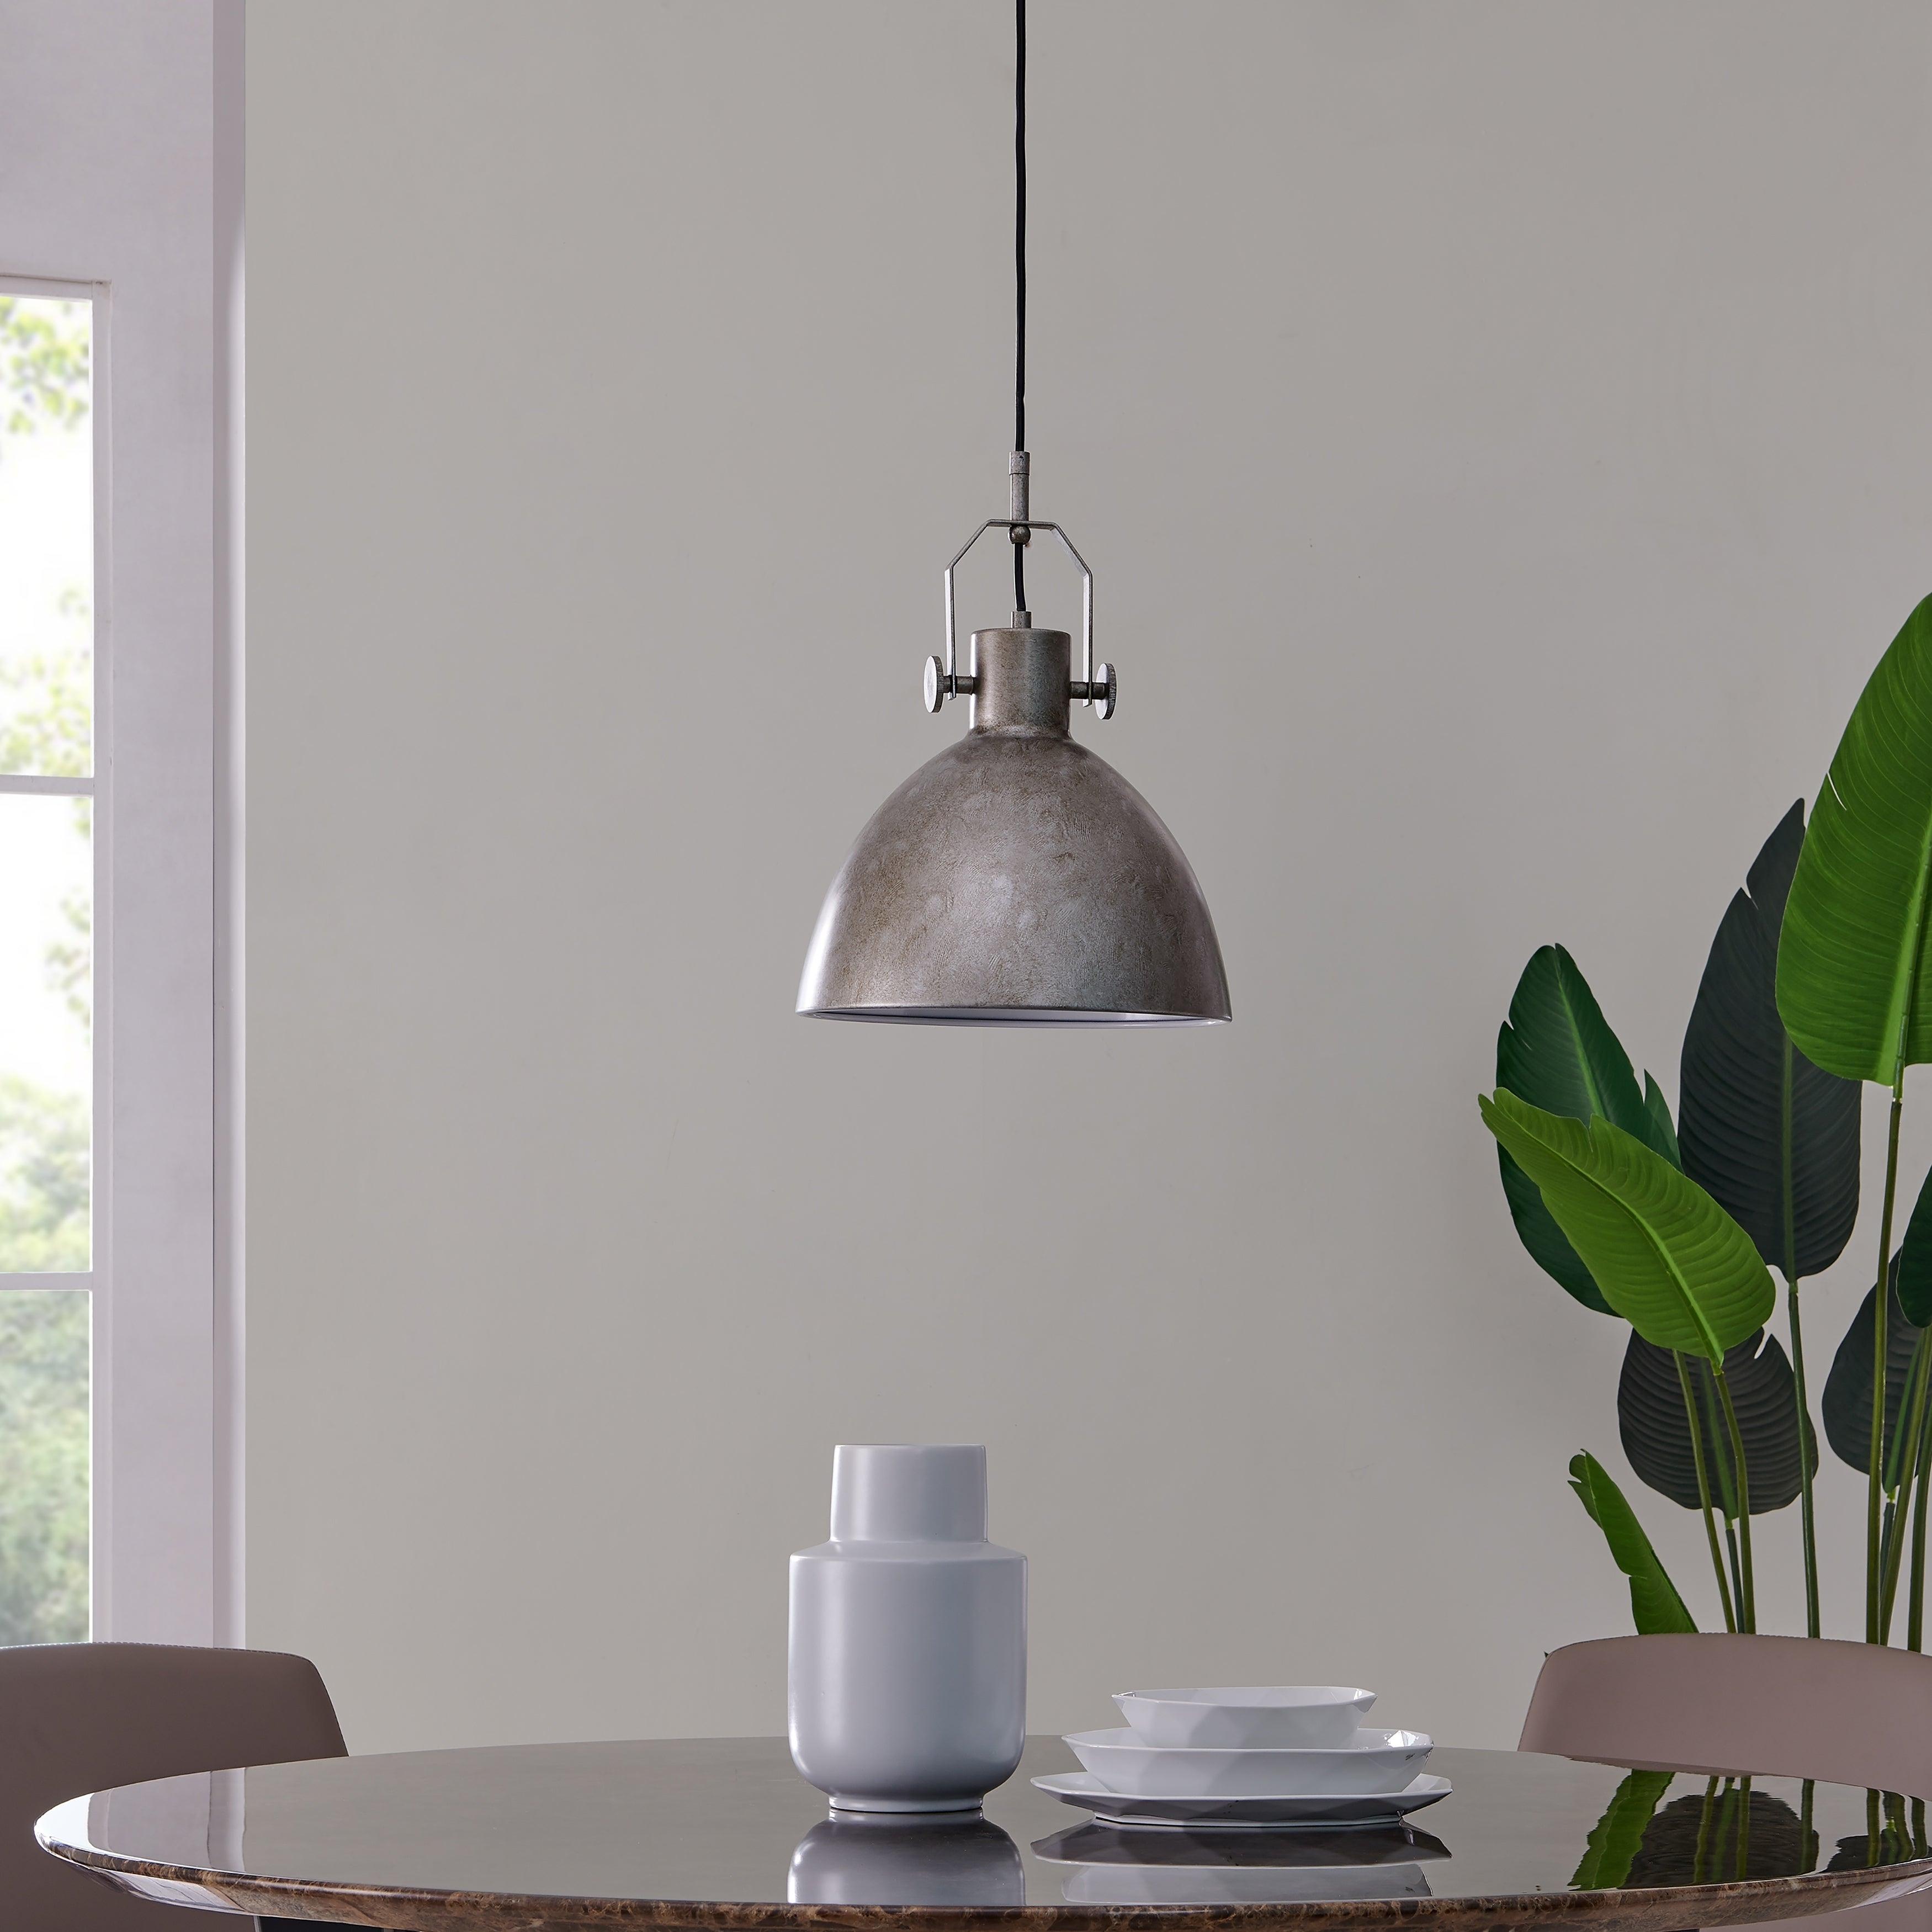 Shop Carbon Loft Almsford Industrial Antique Silver Pendant Light Overstock 28573949